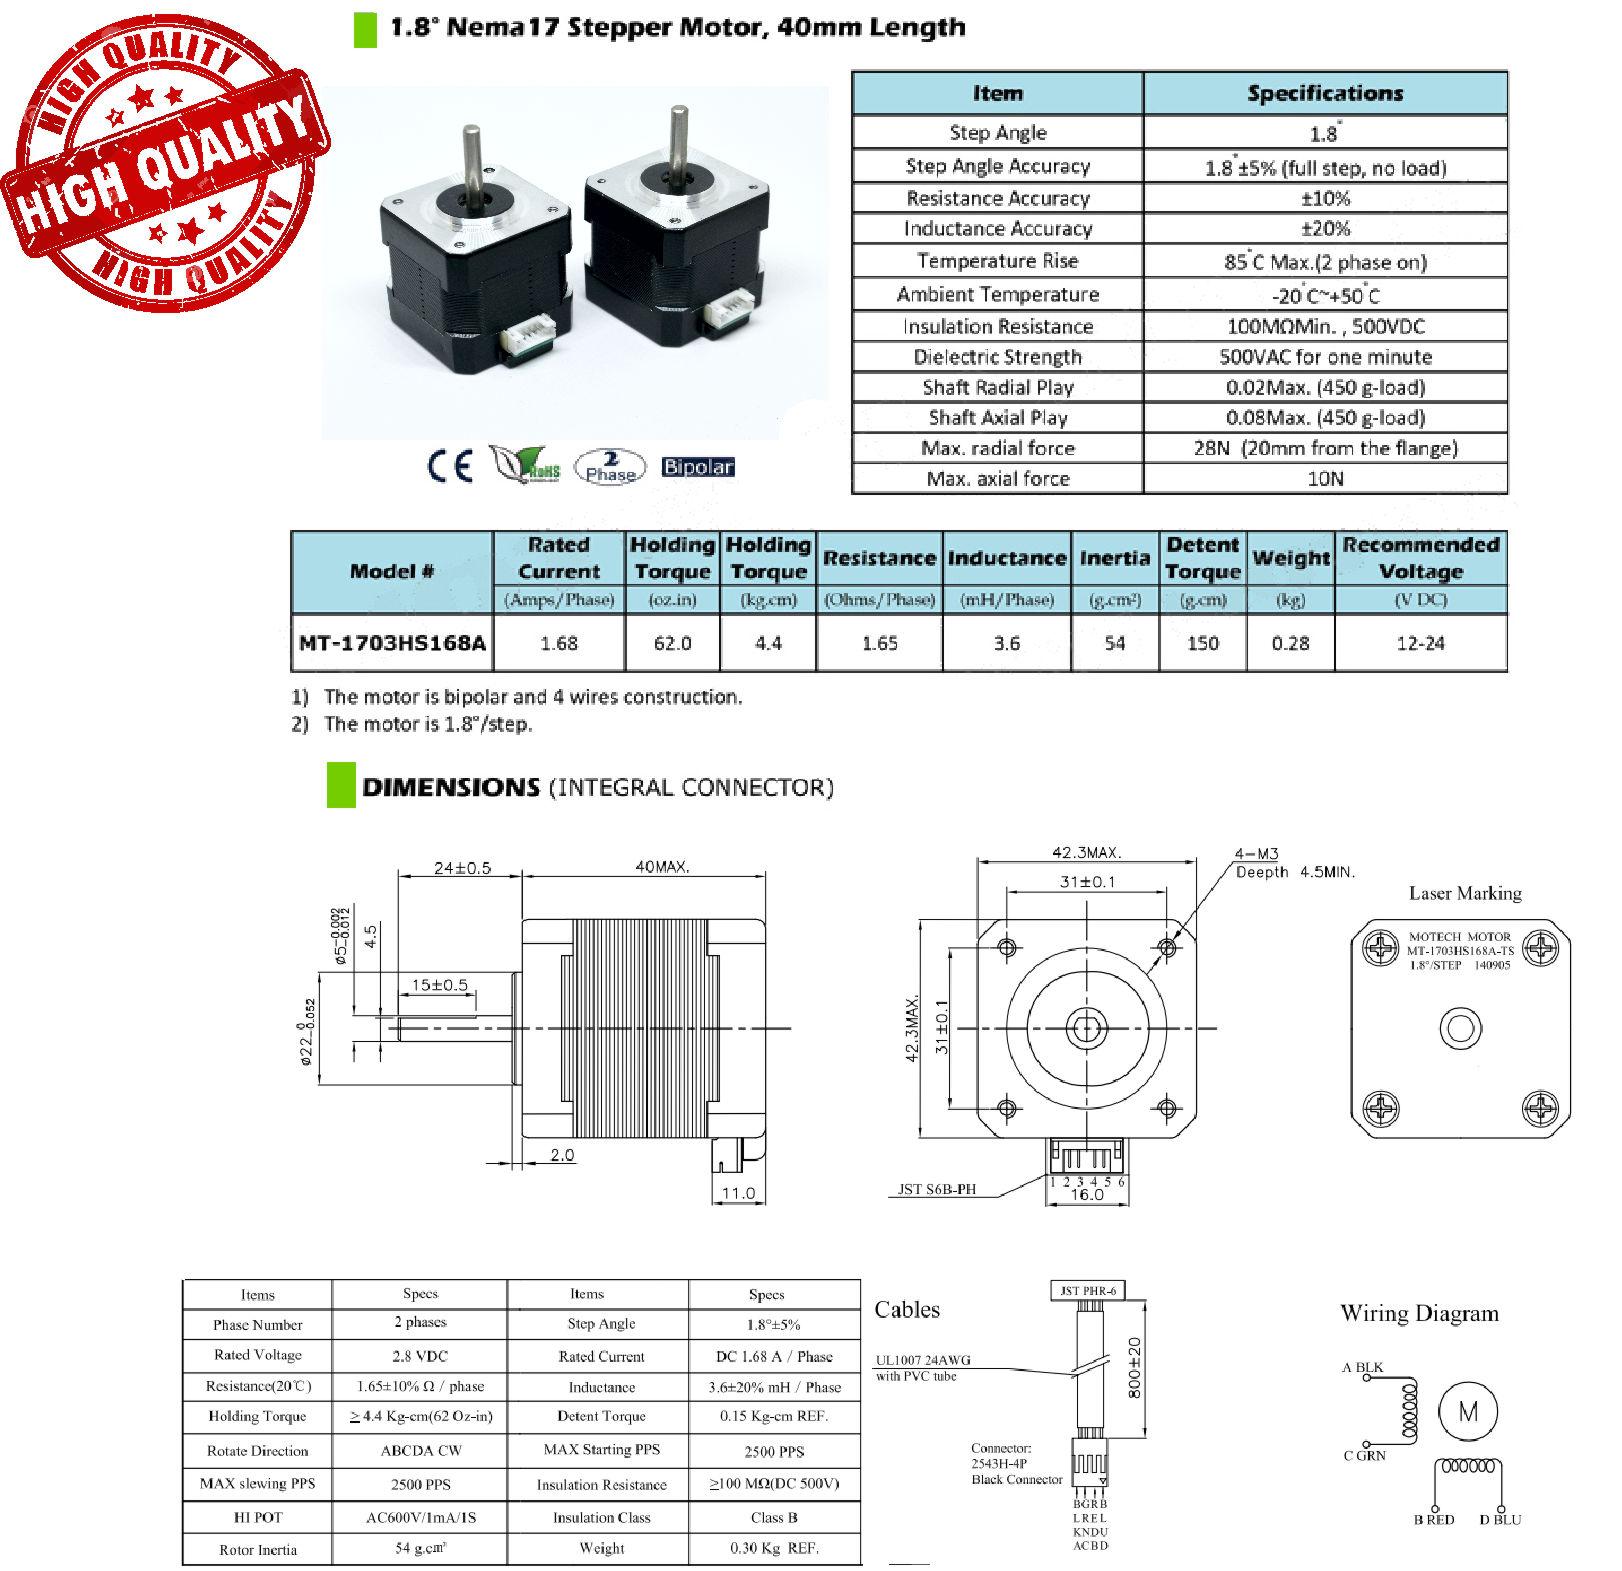 hight resolution of nema 17 stepper motor pack of two custom cables jjrobots description nema 17 wiring diagram